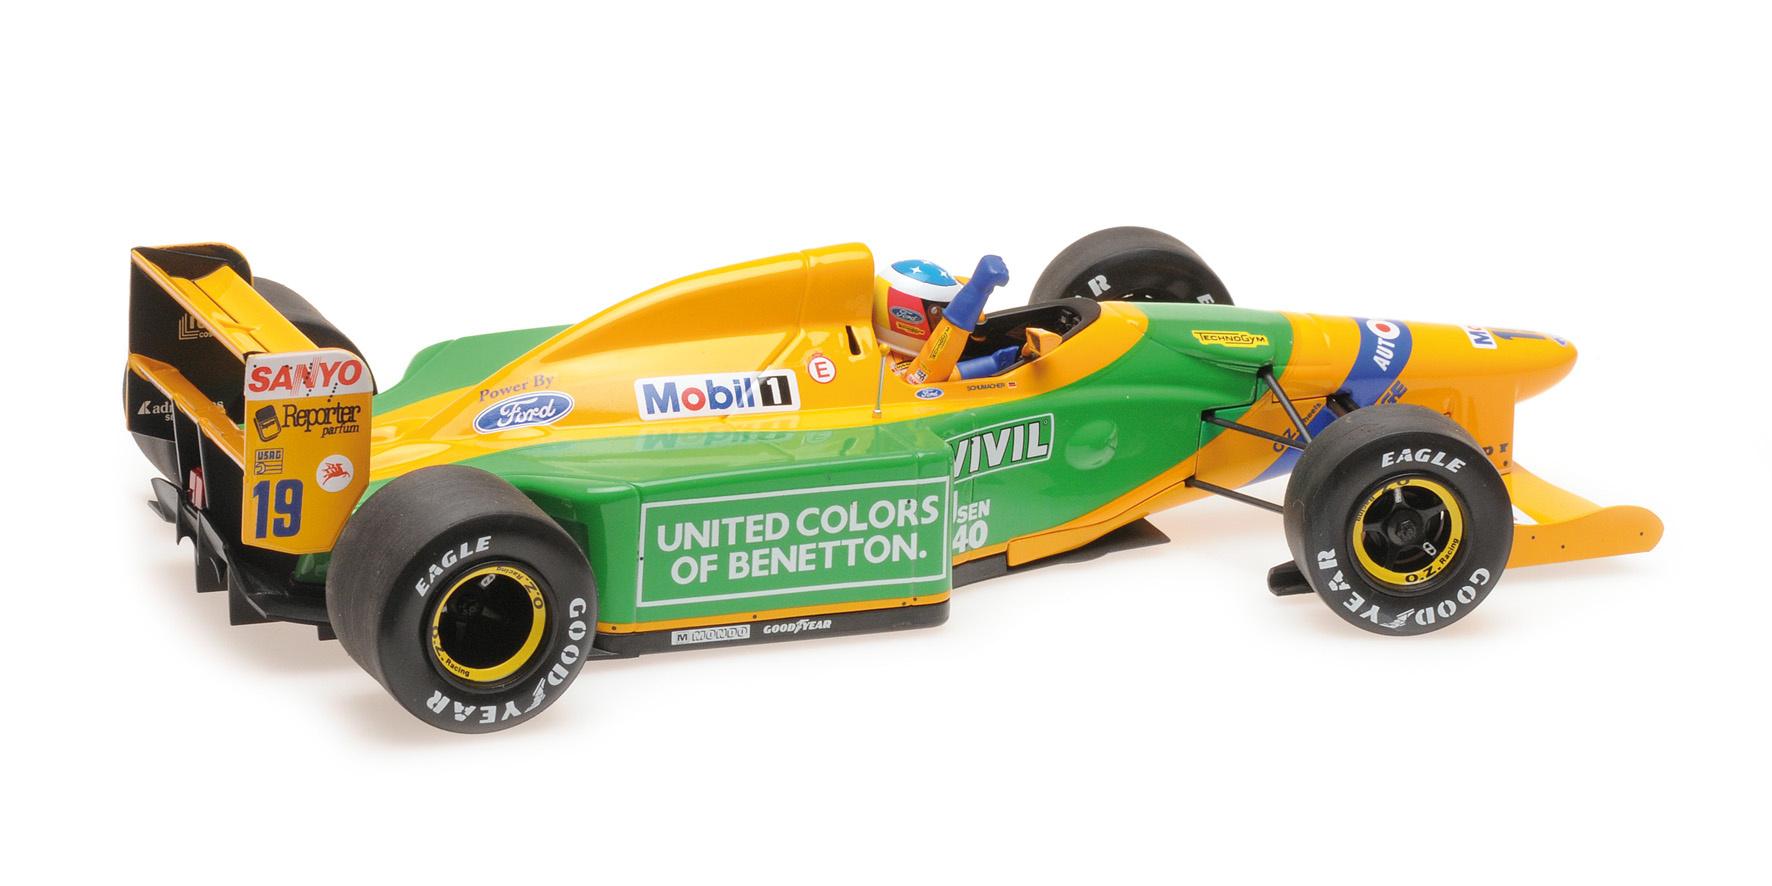 Minichamps 1:18 Schaalmodel Michael Schumacher - Winnaar Belgie 1992 - Benneton Ford B192